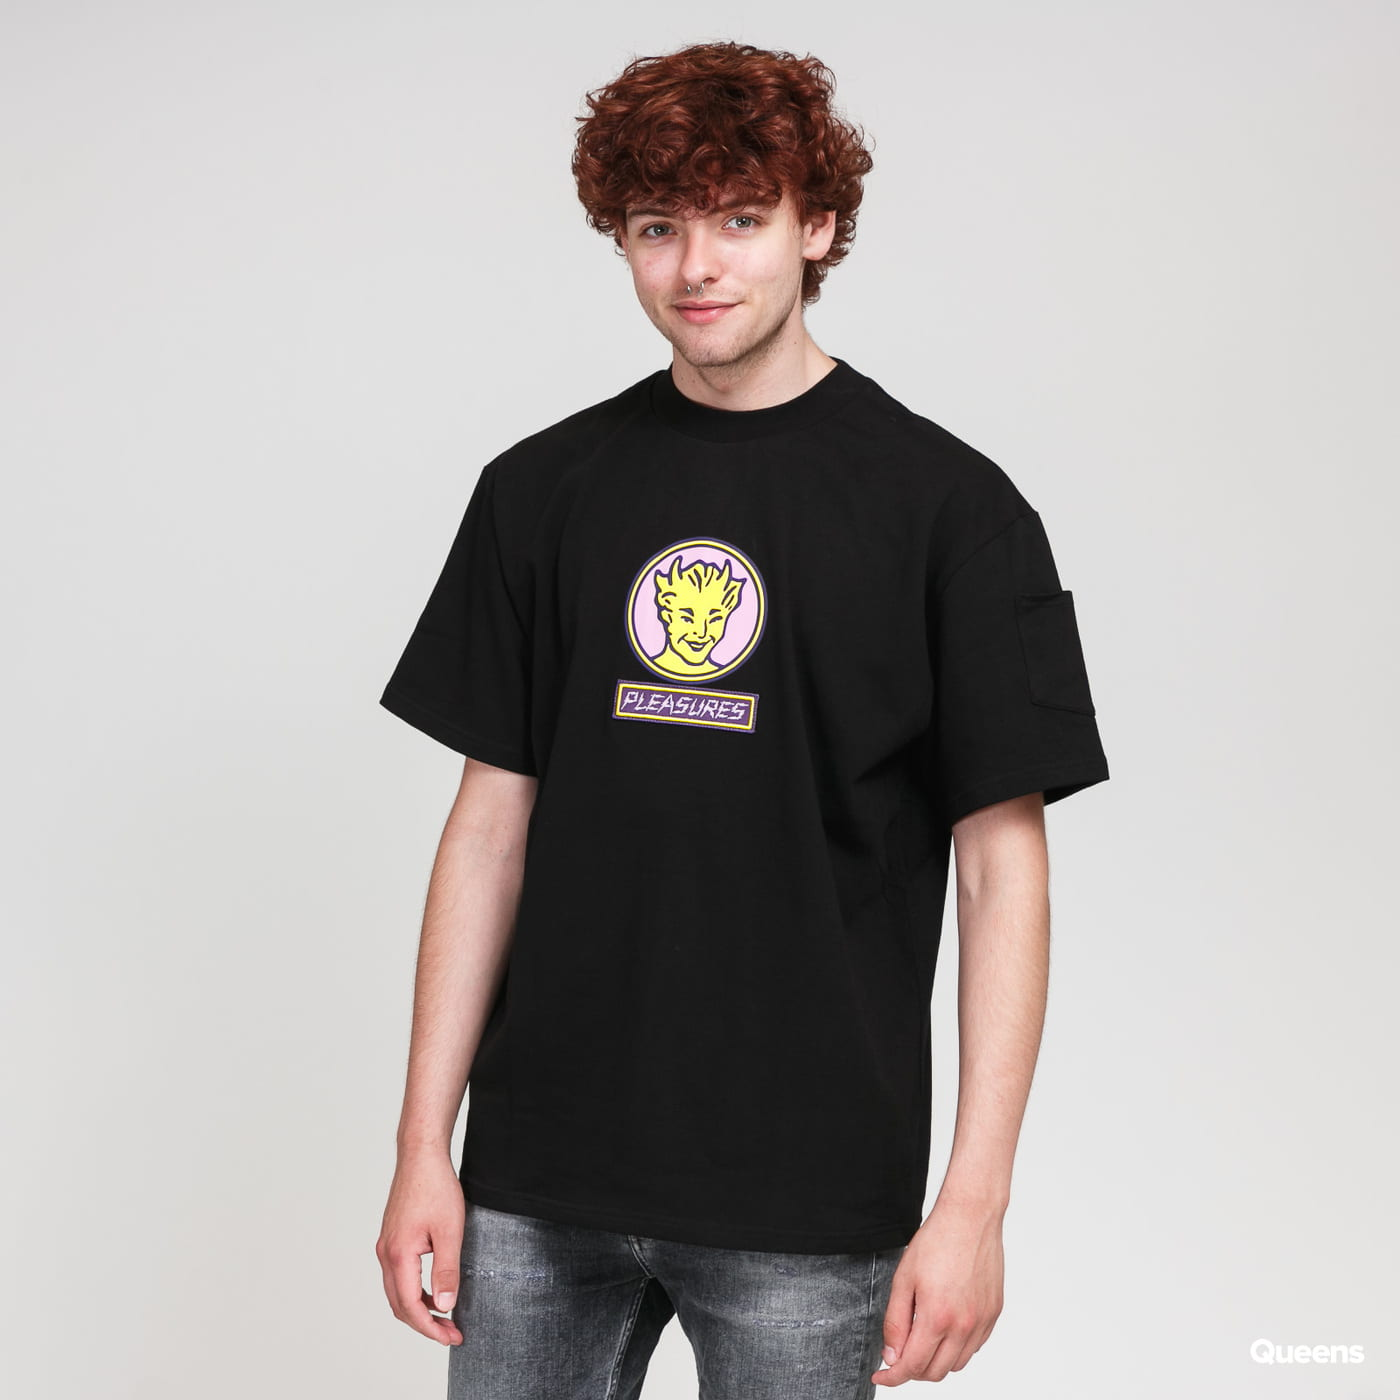 PLEASURES Hot Stuff Heavyweight Shirt black